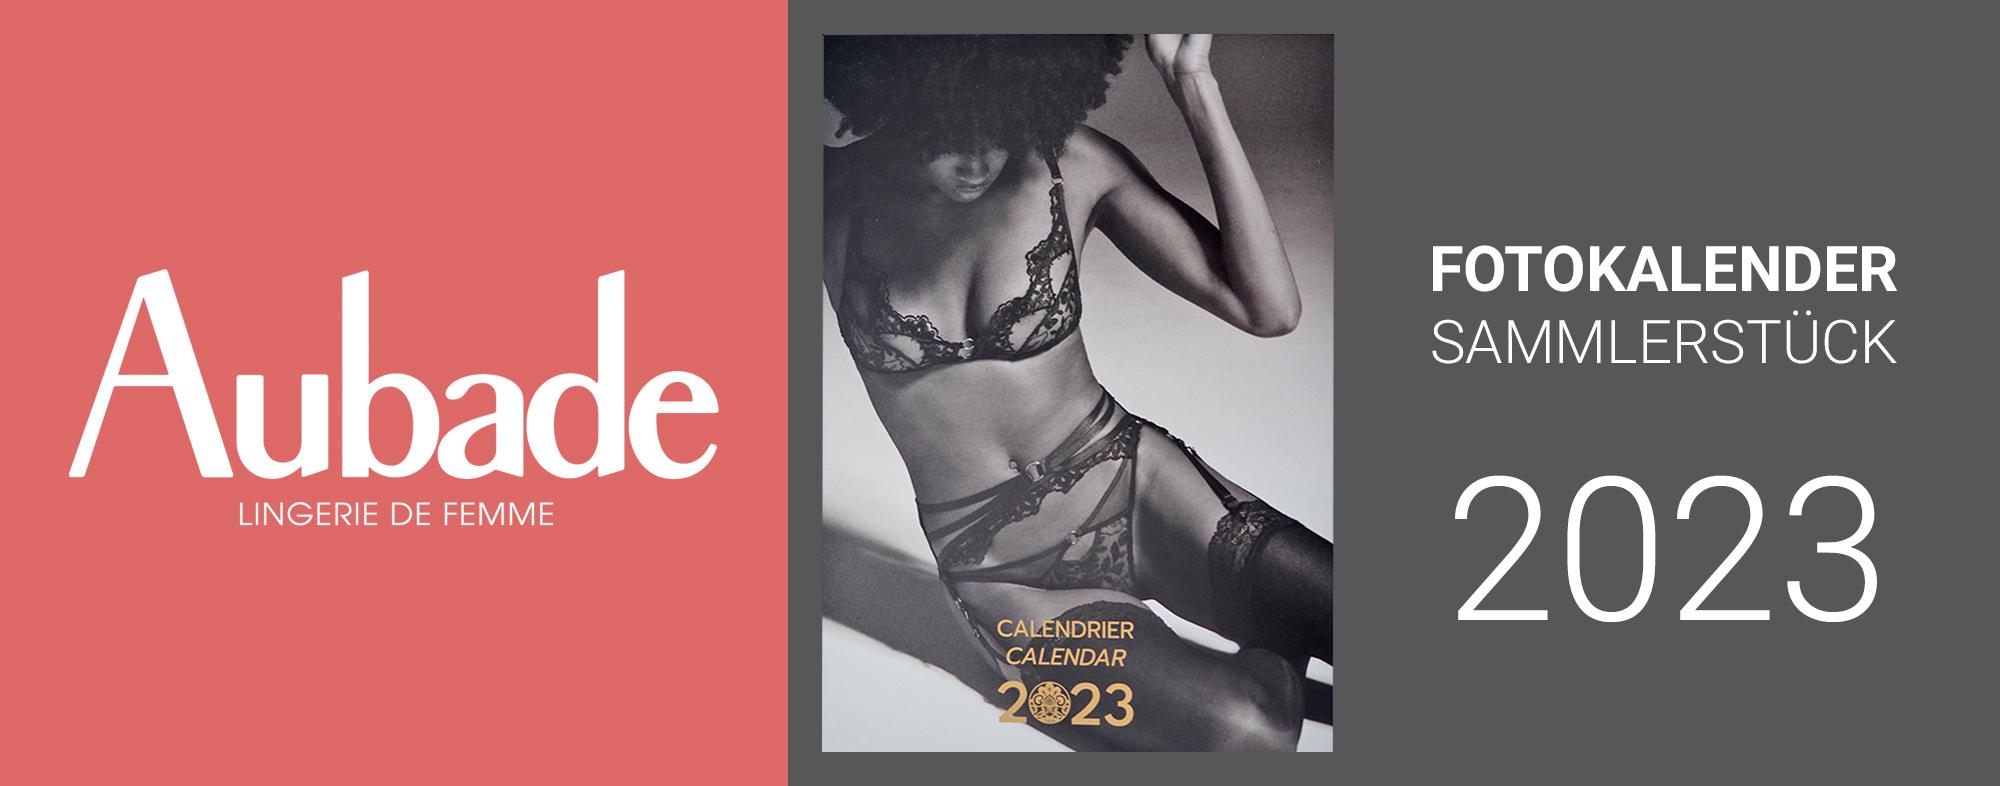 Aubade - Kalender